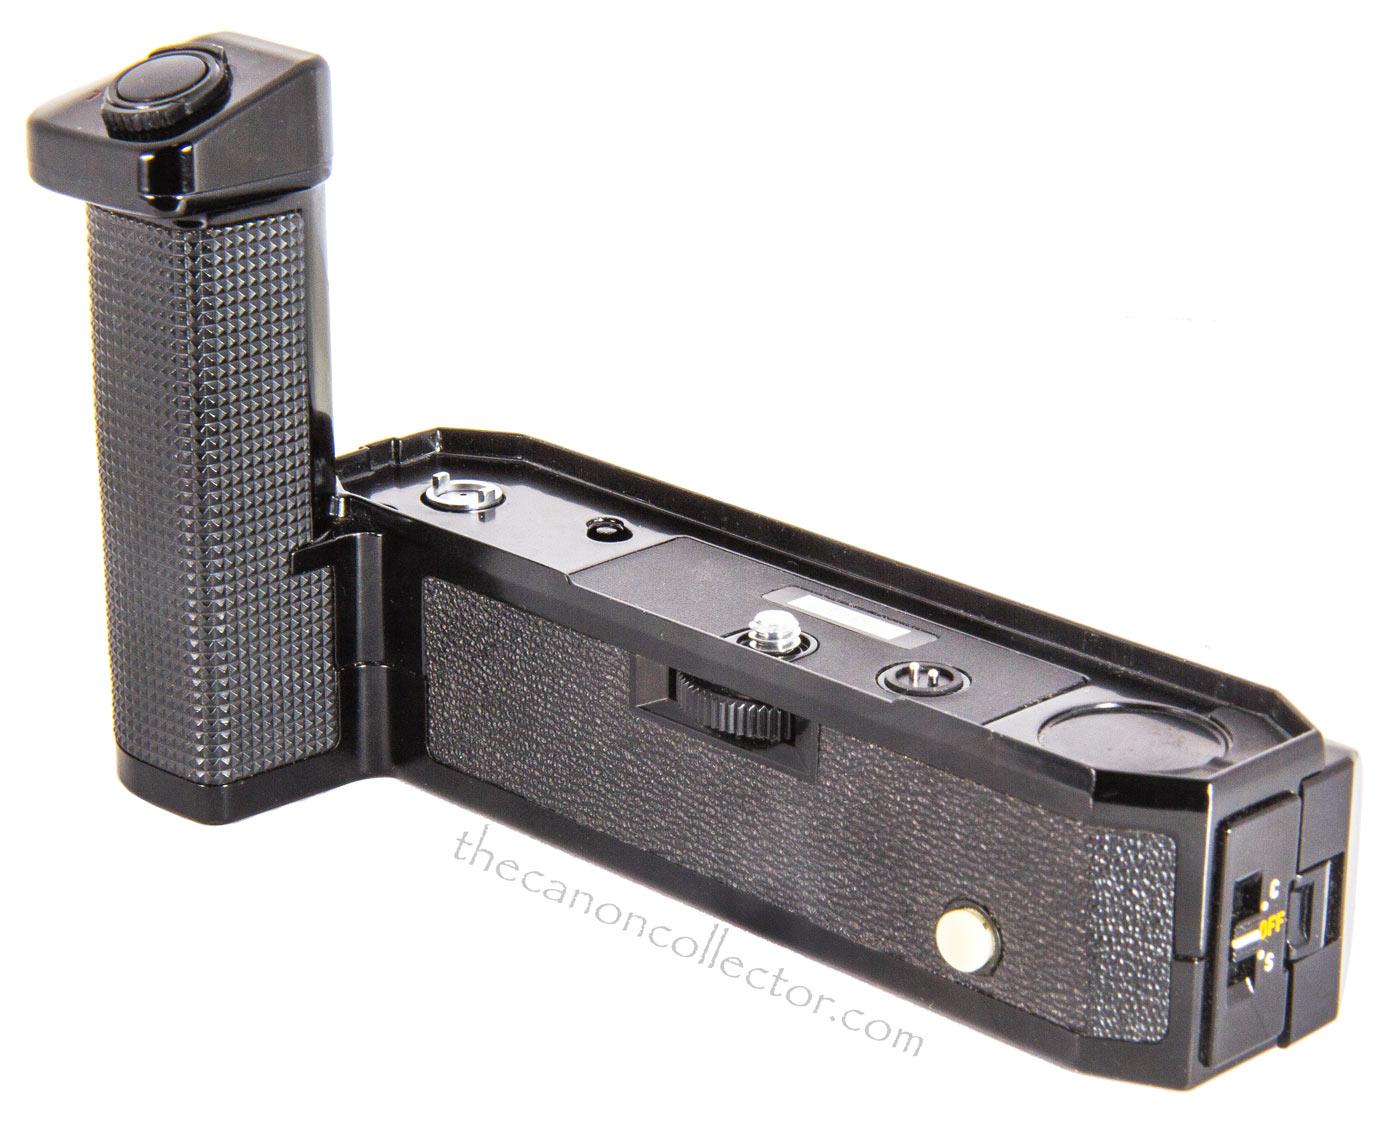 Canon Power Winder F